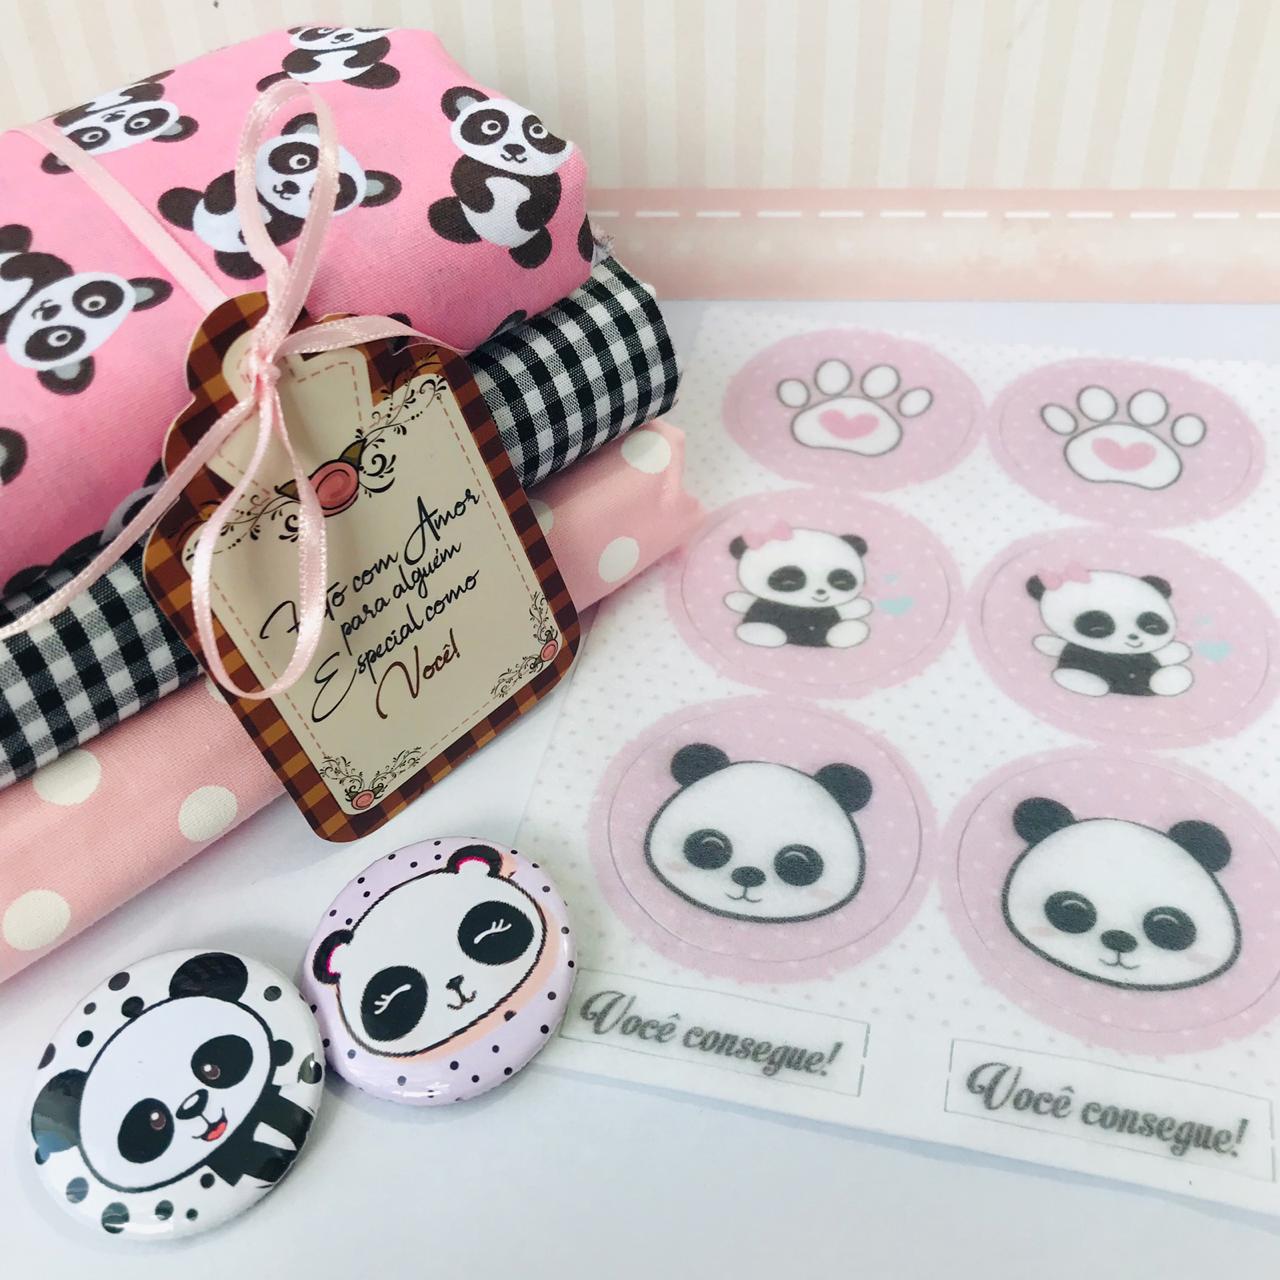 Kit Coordenado Panda - Tecido, Tag e Botton Variável